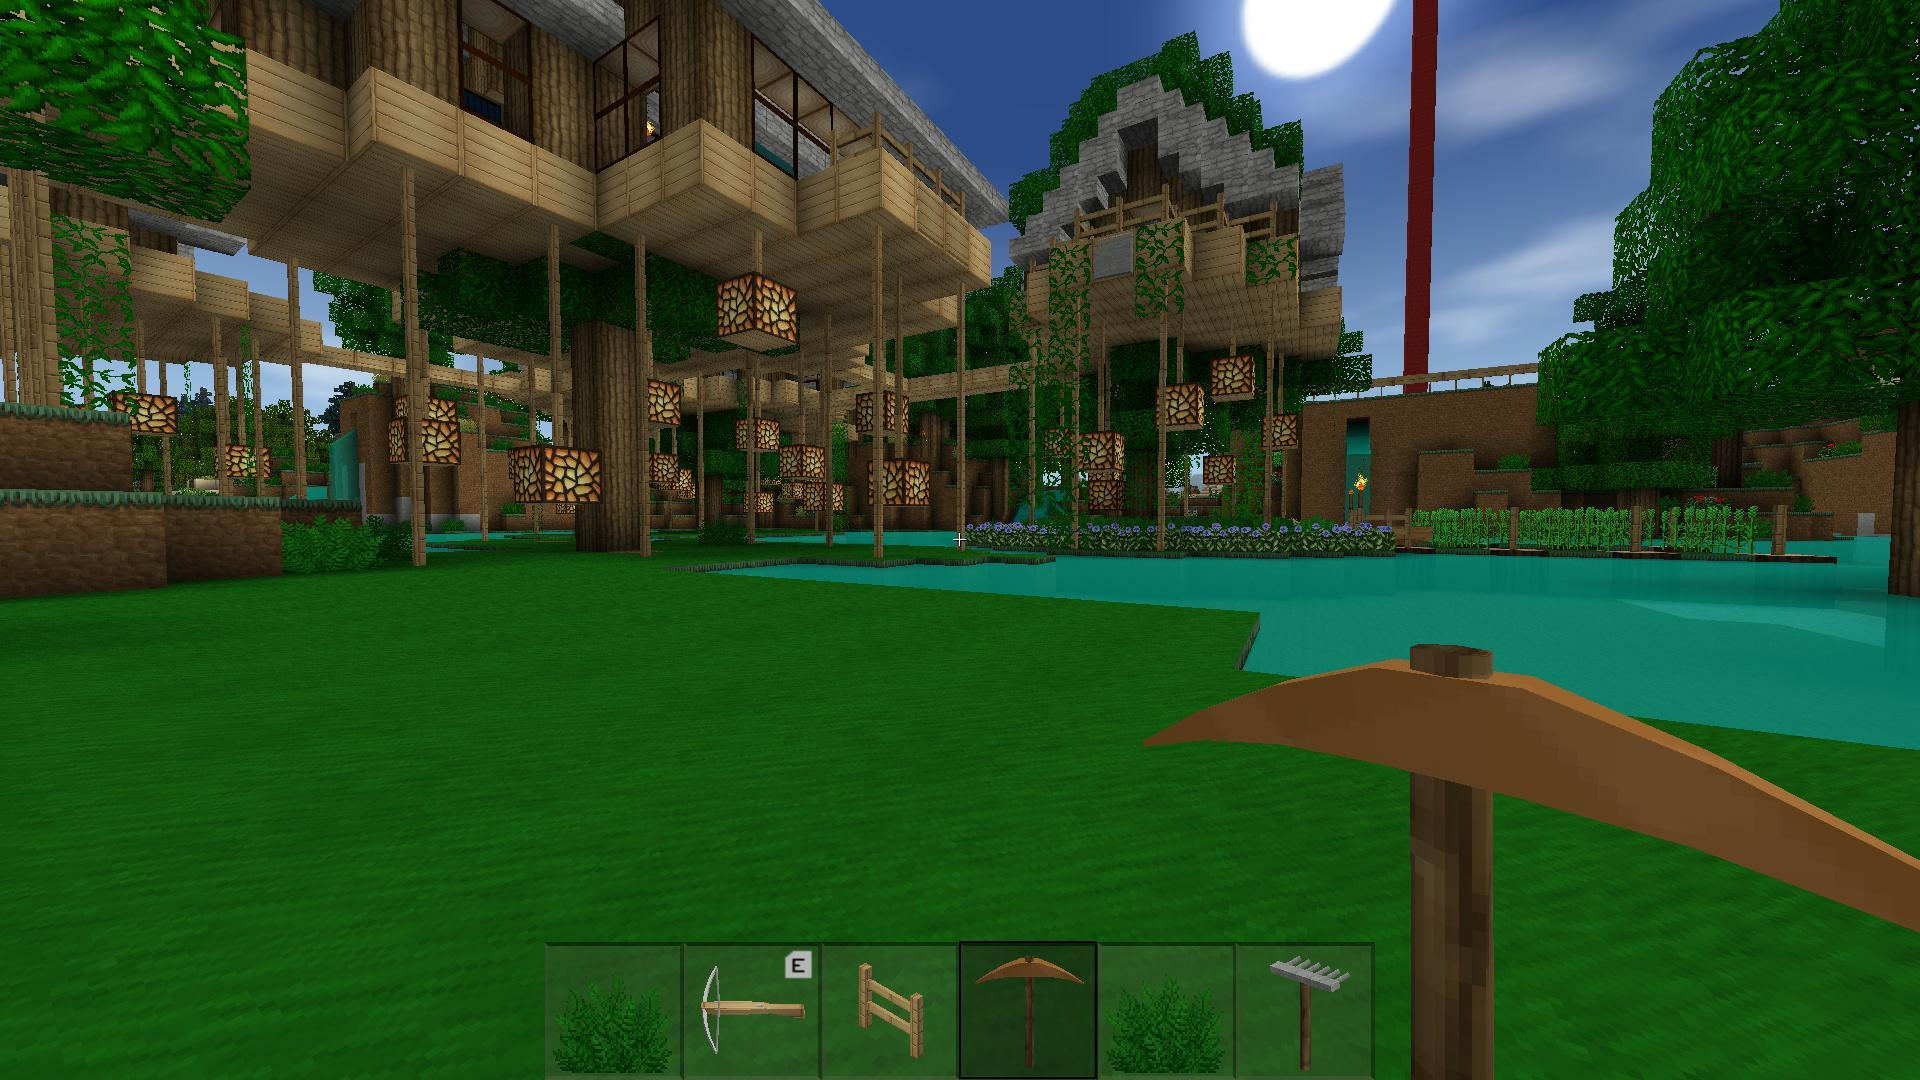 Survivalcraft Demo 1.29.54.0 Screenshot 23